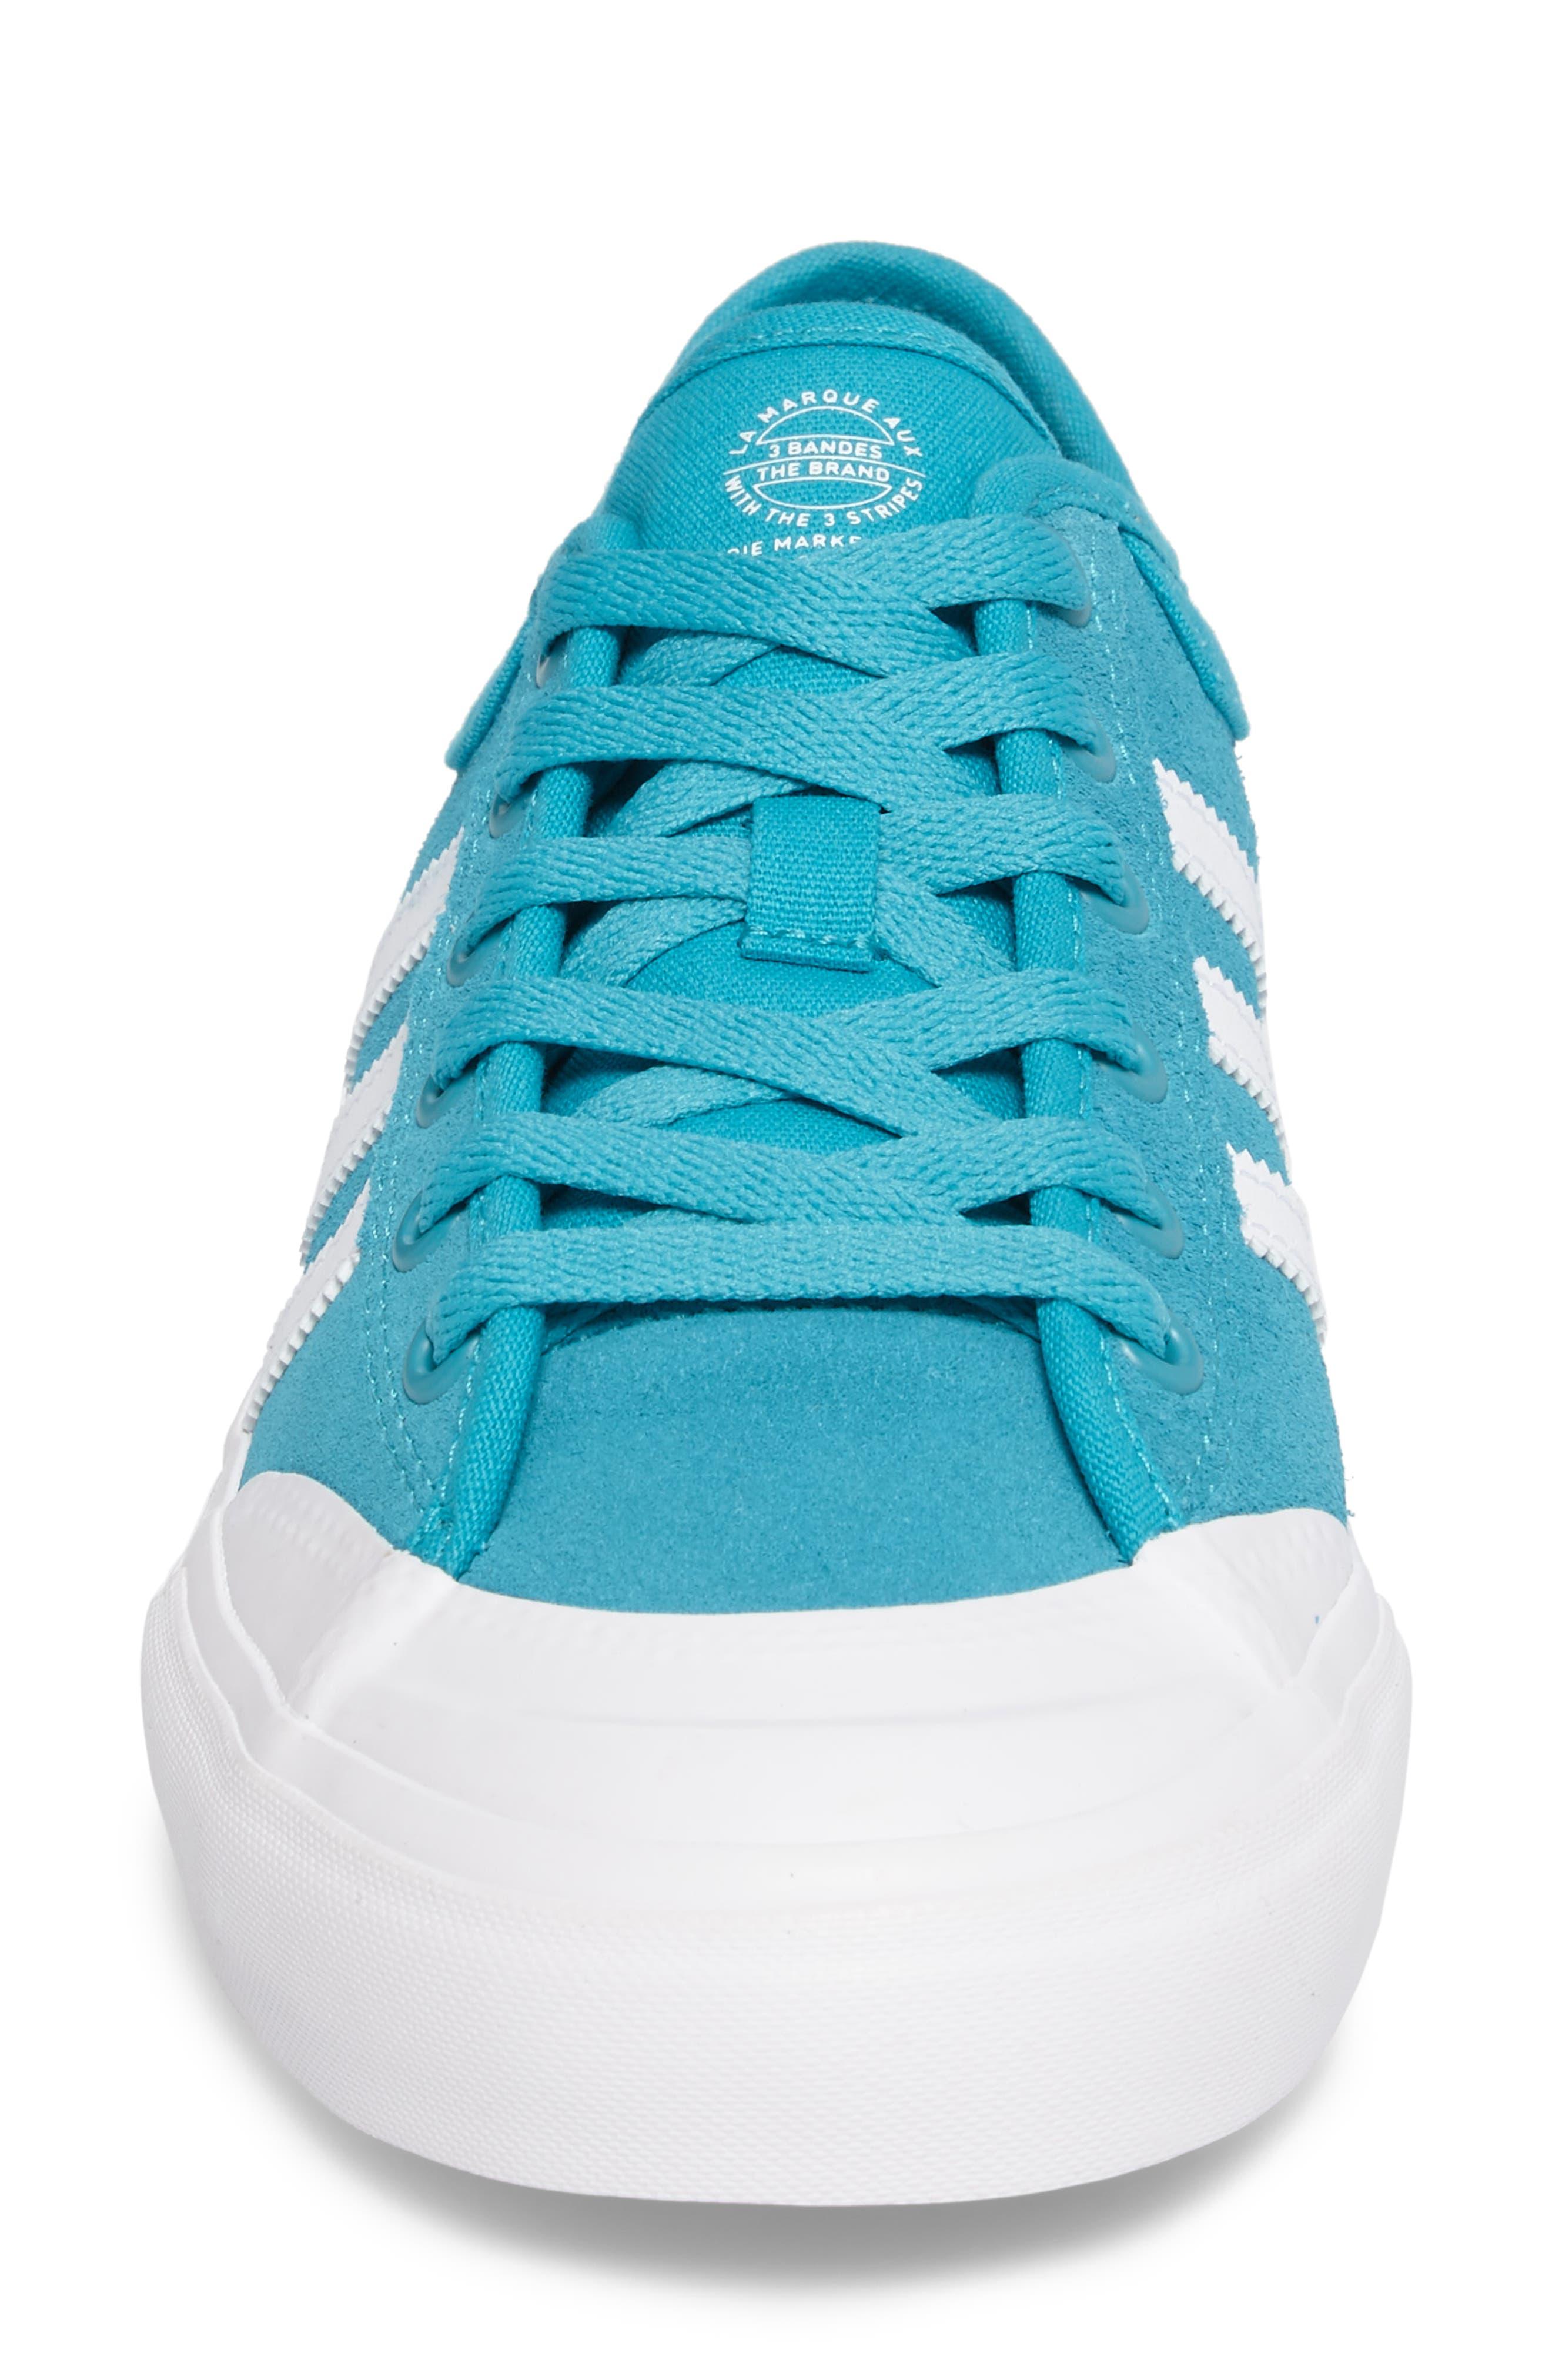 ADIDAS,                             Matchcourt Mid High Sneaker,                             Alternate thumbnail 4, color,                             400